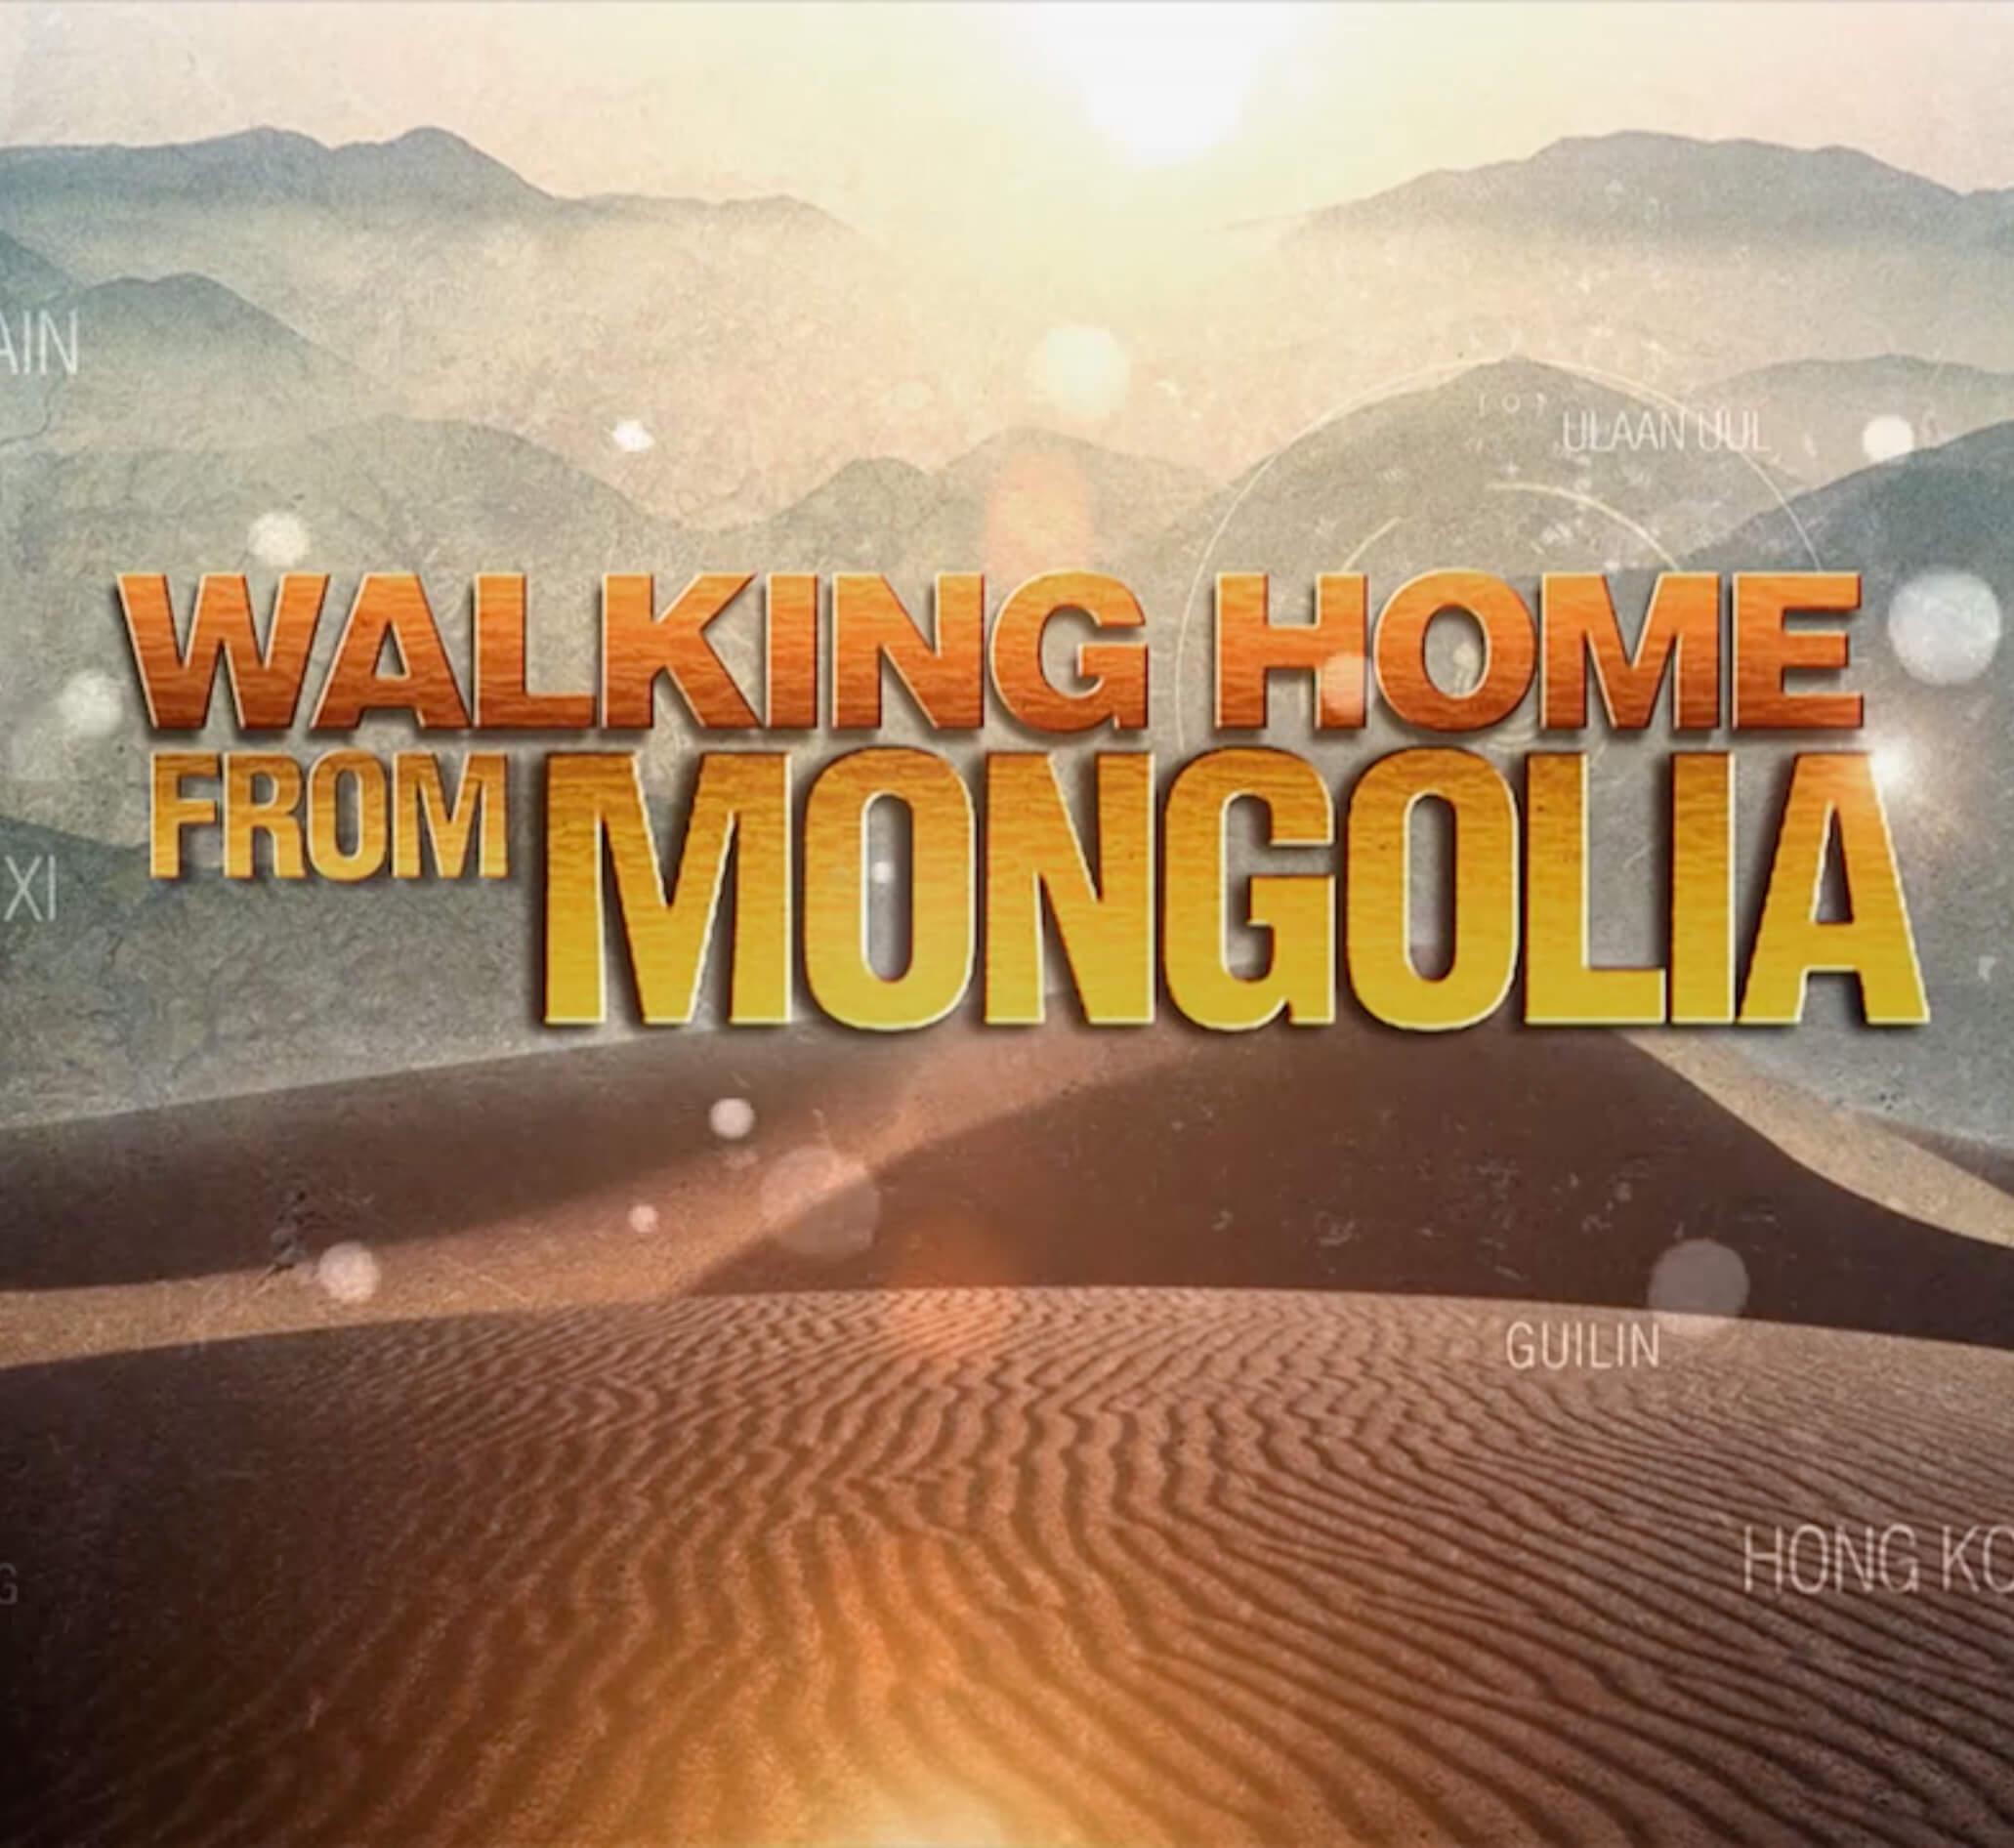 roblilwall-motivational-keynote-speaker-adventurer-author-walking-home-from-mongolia